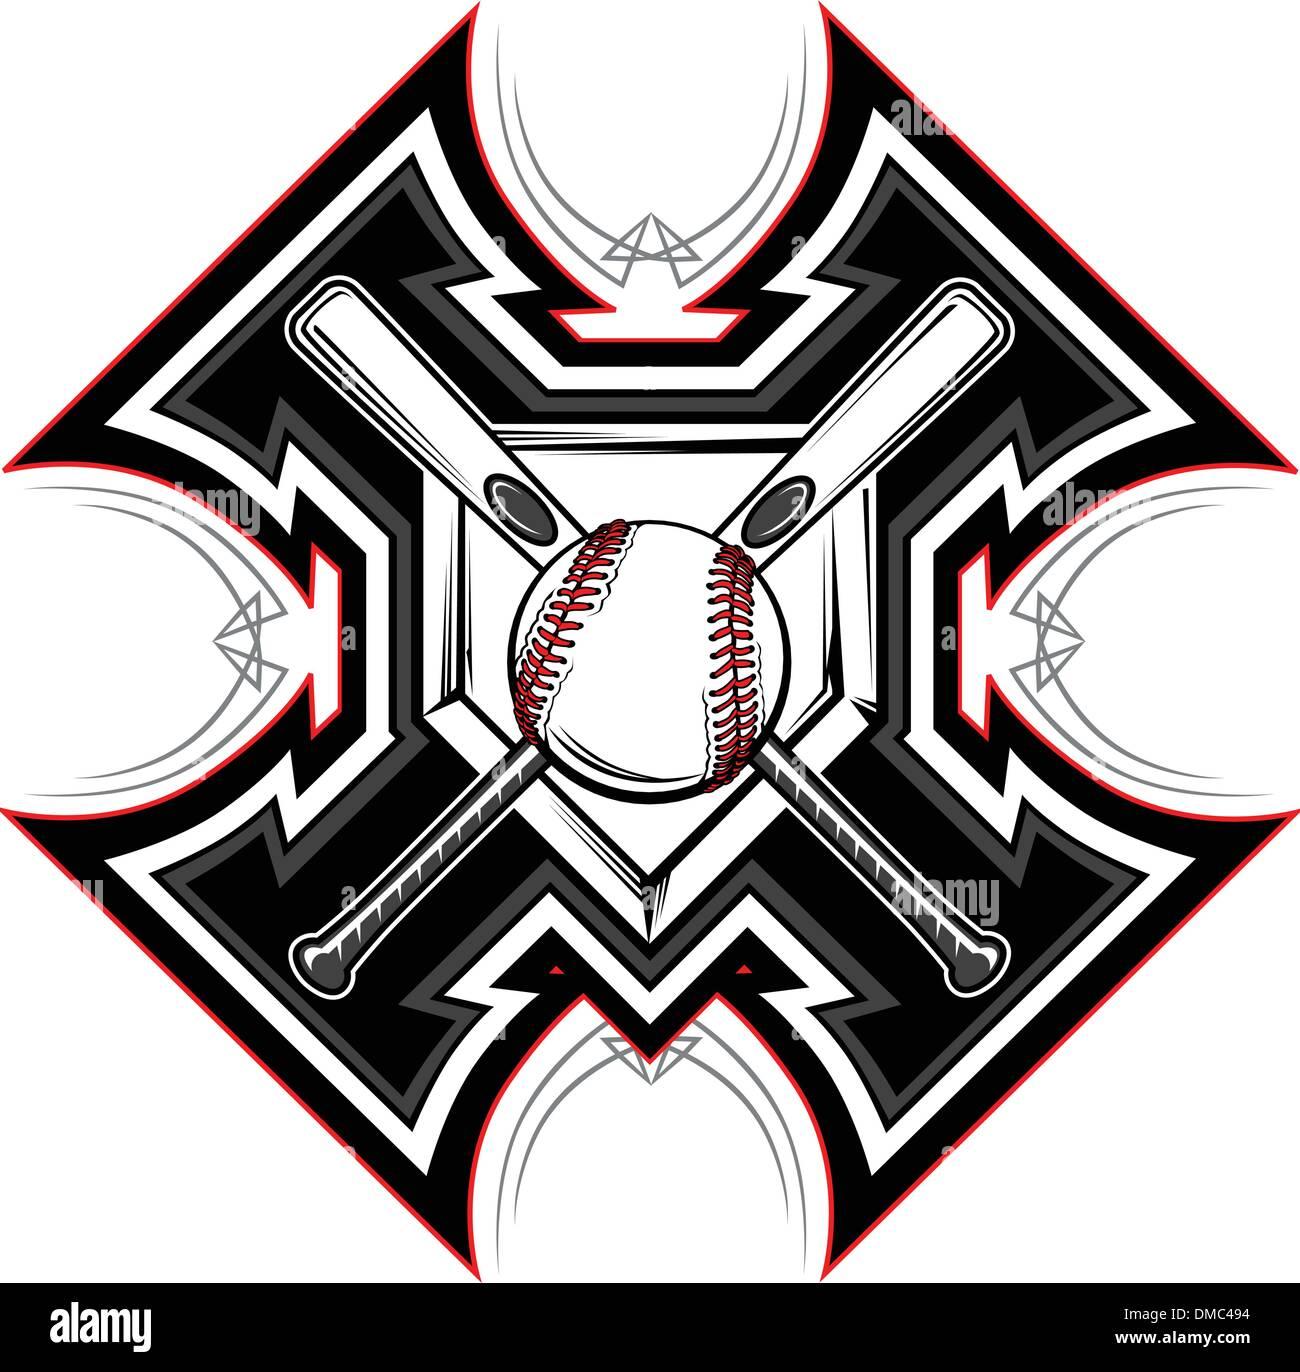 7a3efdc1a Baseball Softball Bats Graphic Vector Template Stock Vector Art ...